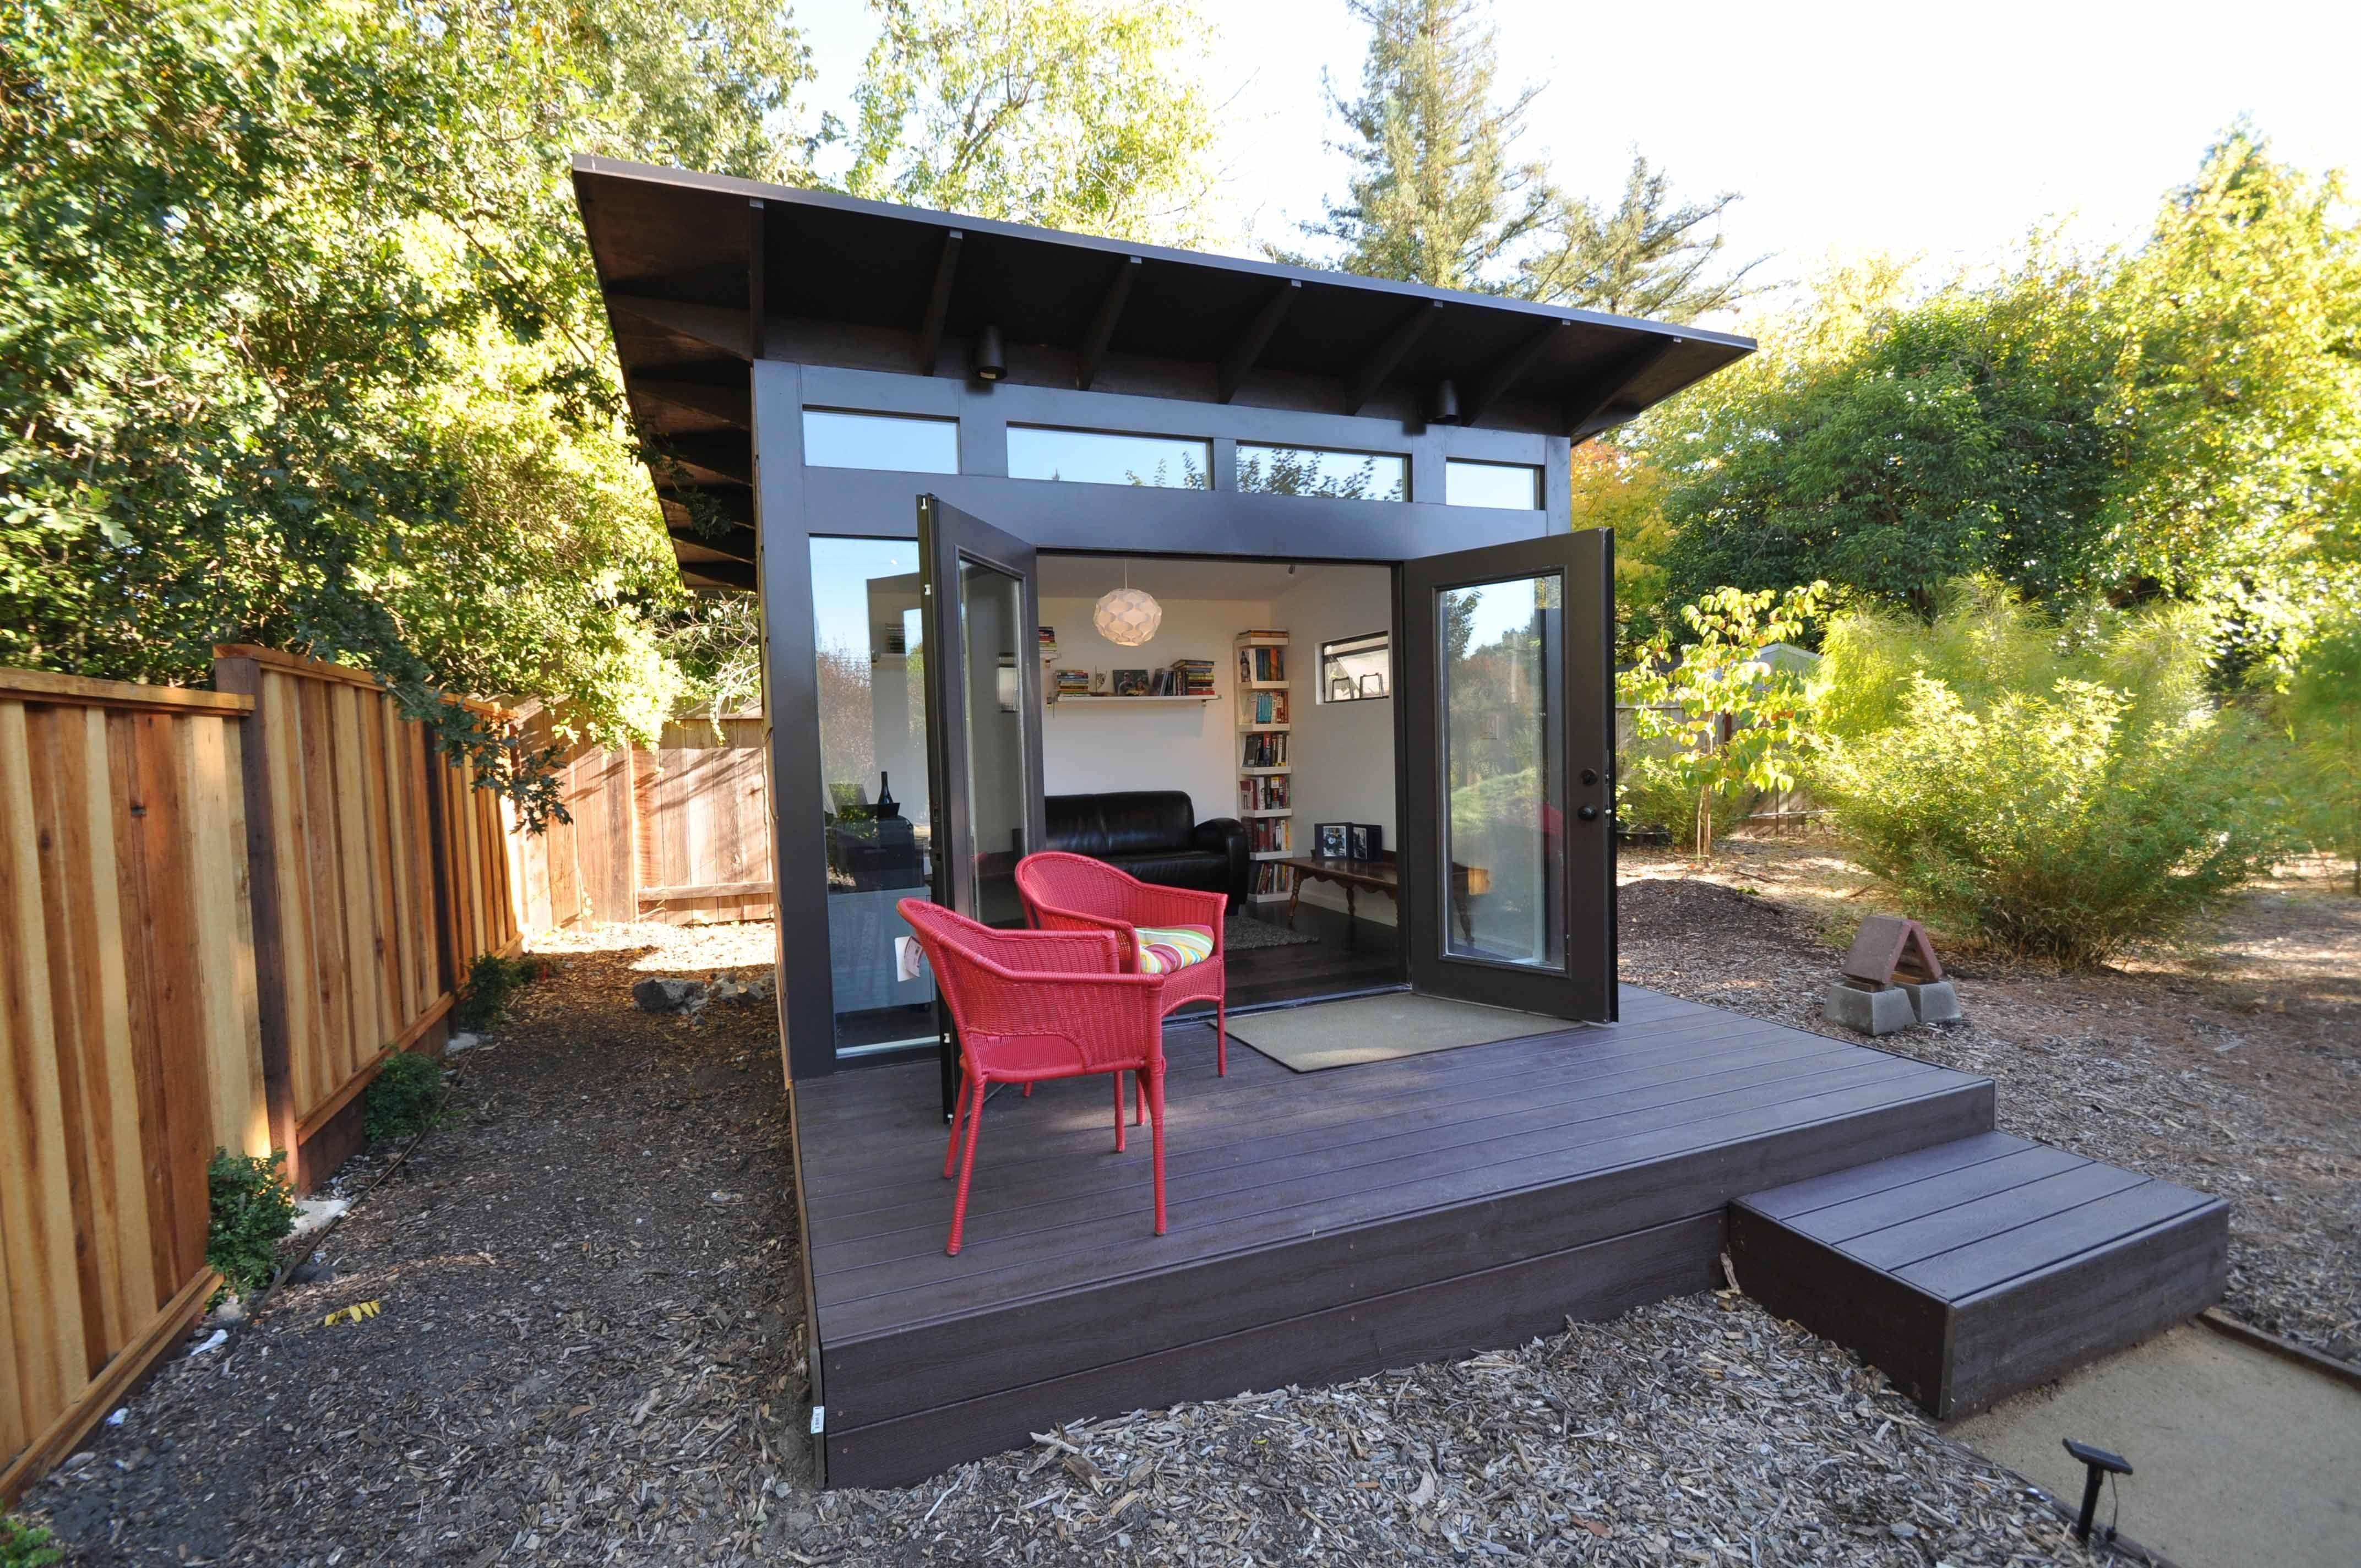 Studio Shed Photos - Modern, Prefab Backyard Studios & Home